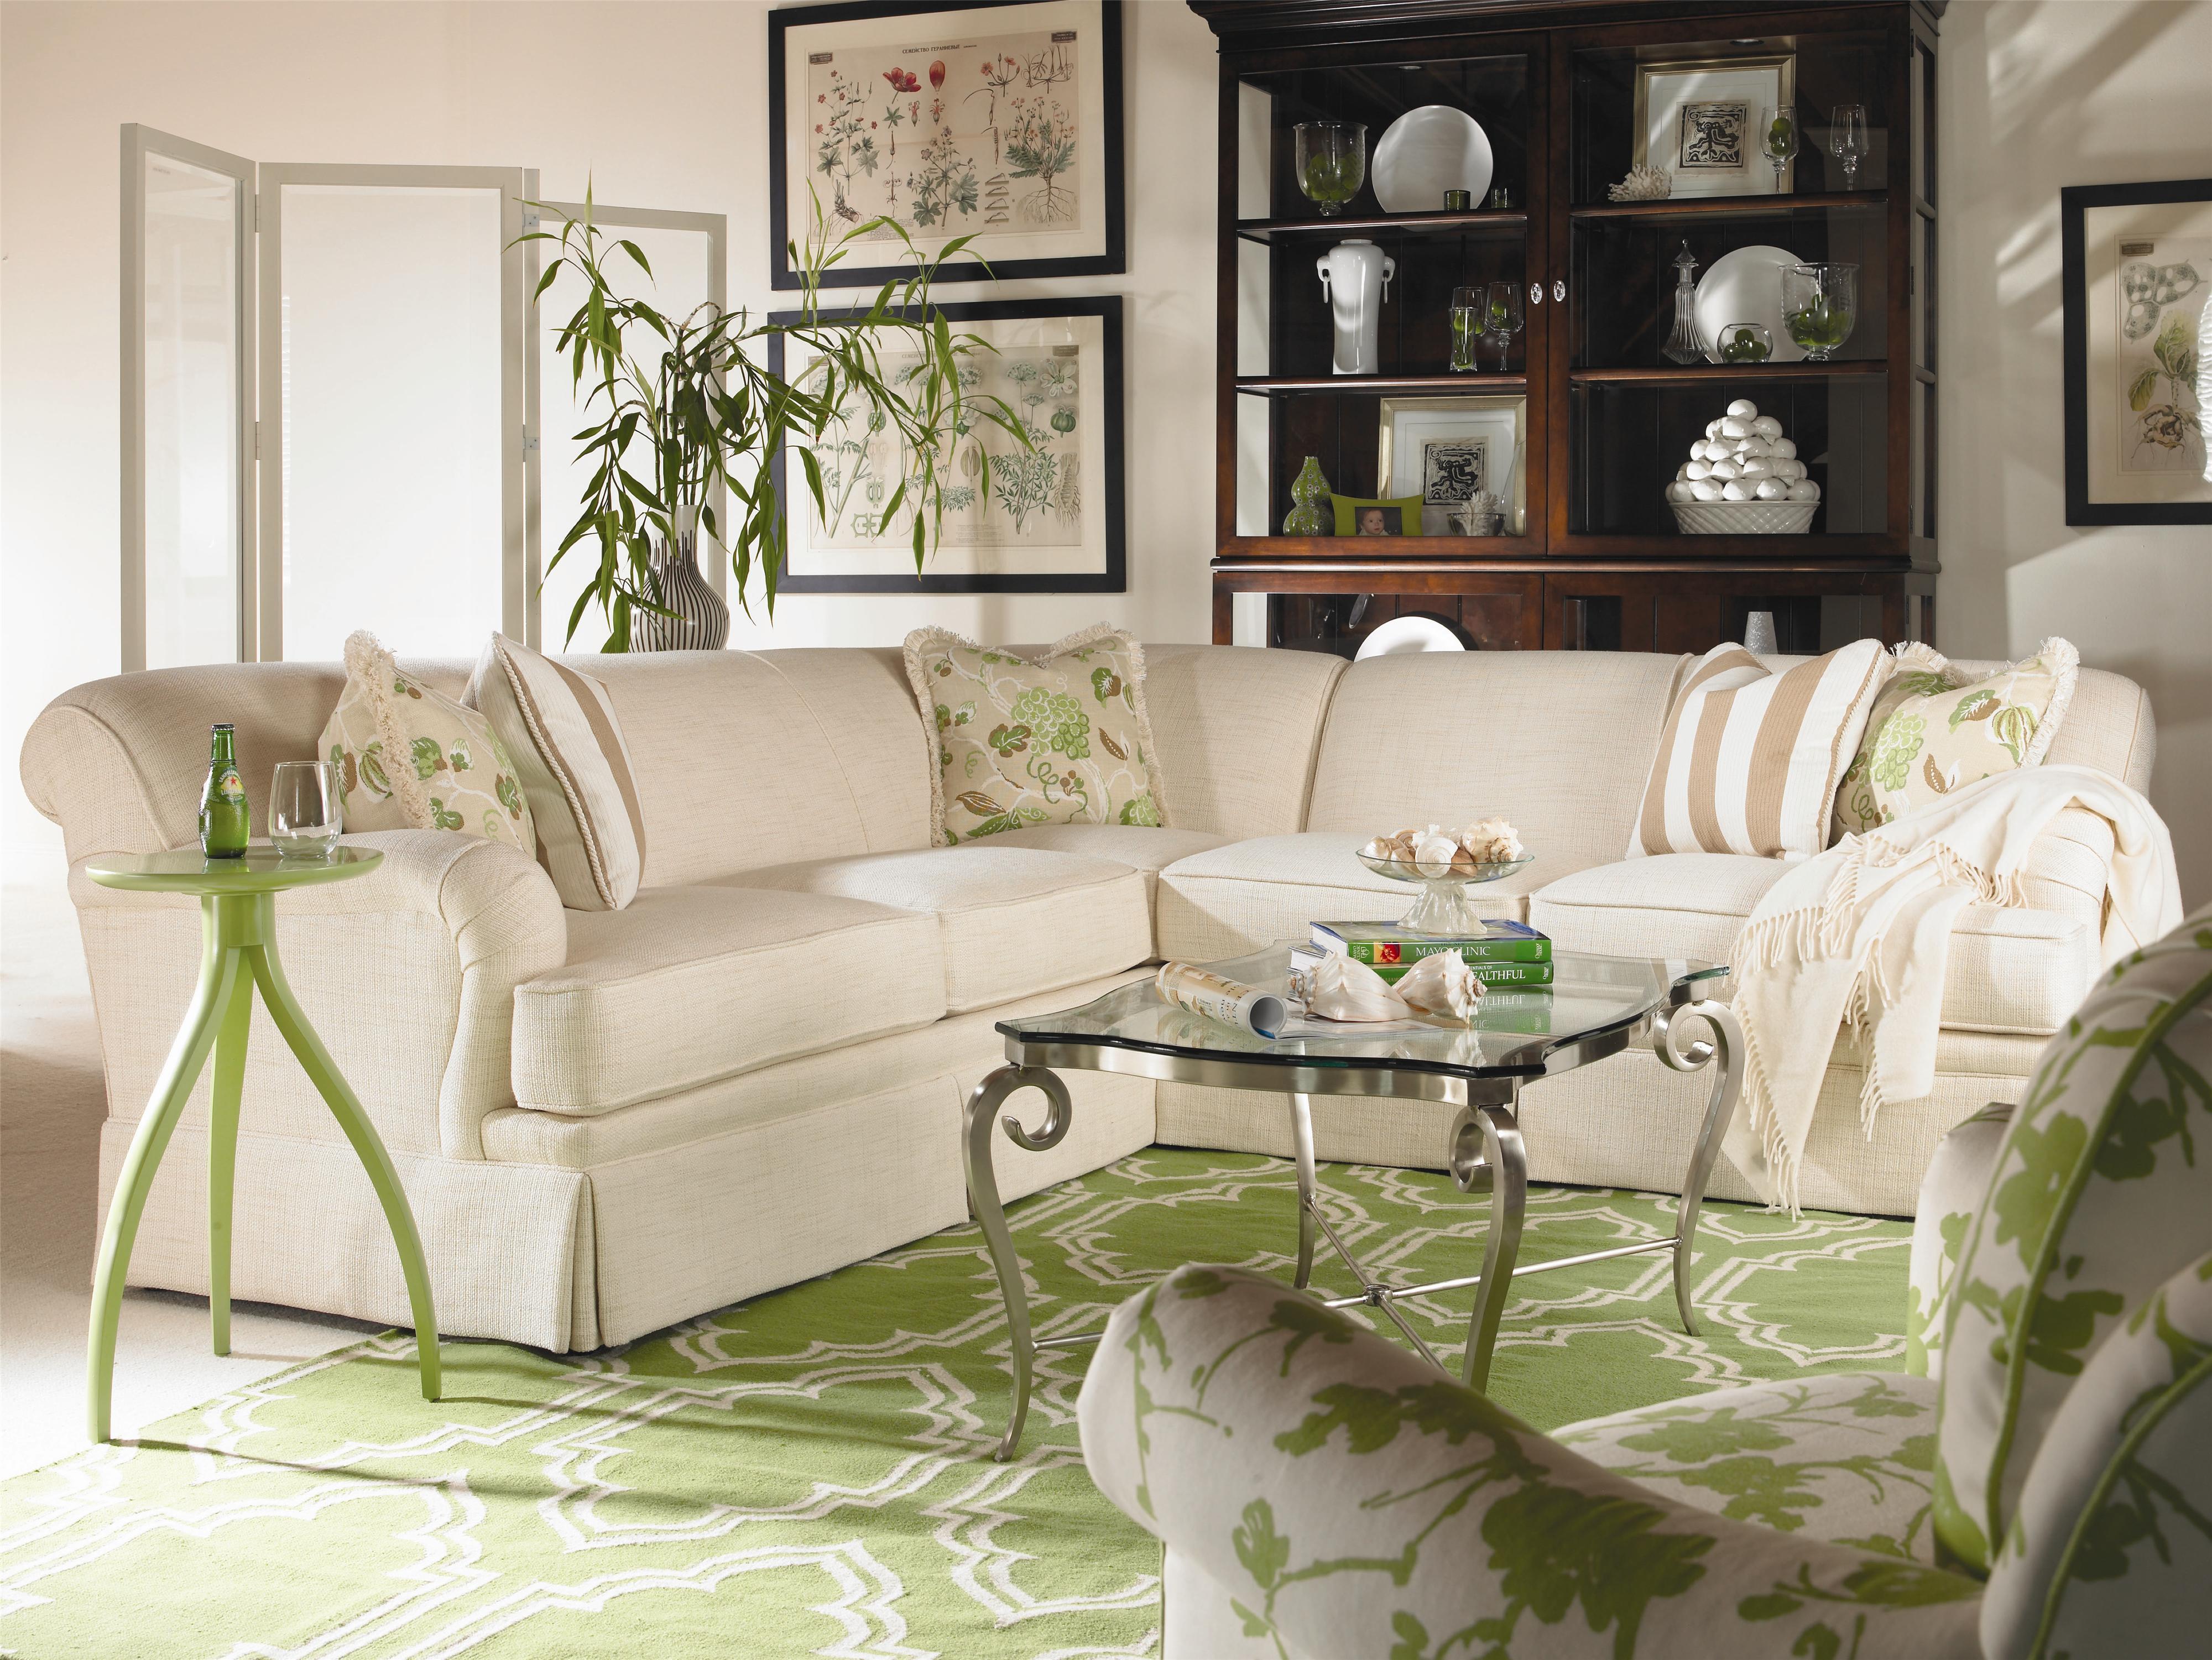 Century Cornerstone <b>Customizable</b> Sectional Sofa with English ...